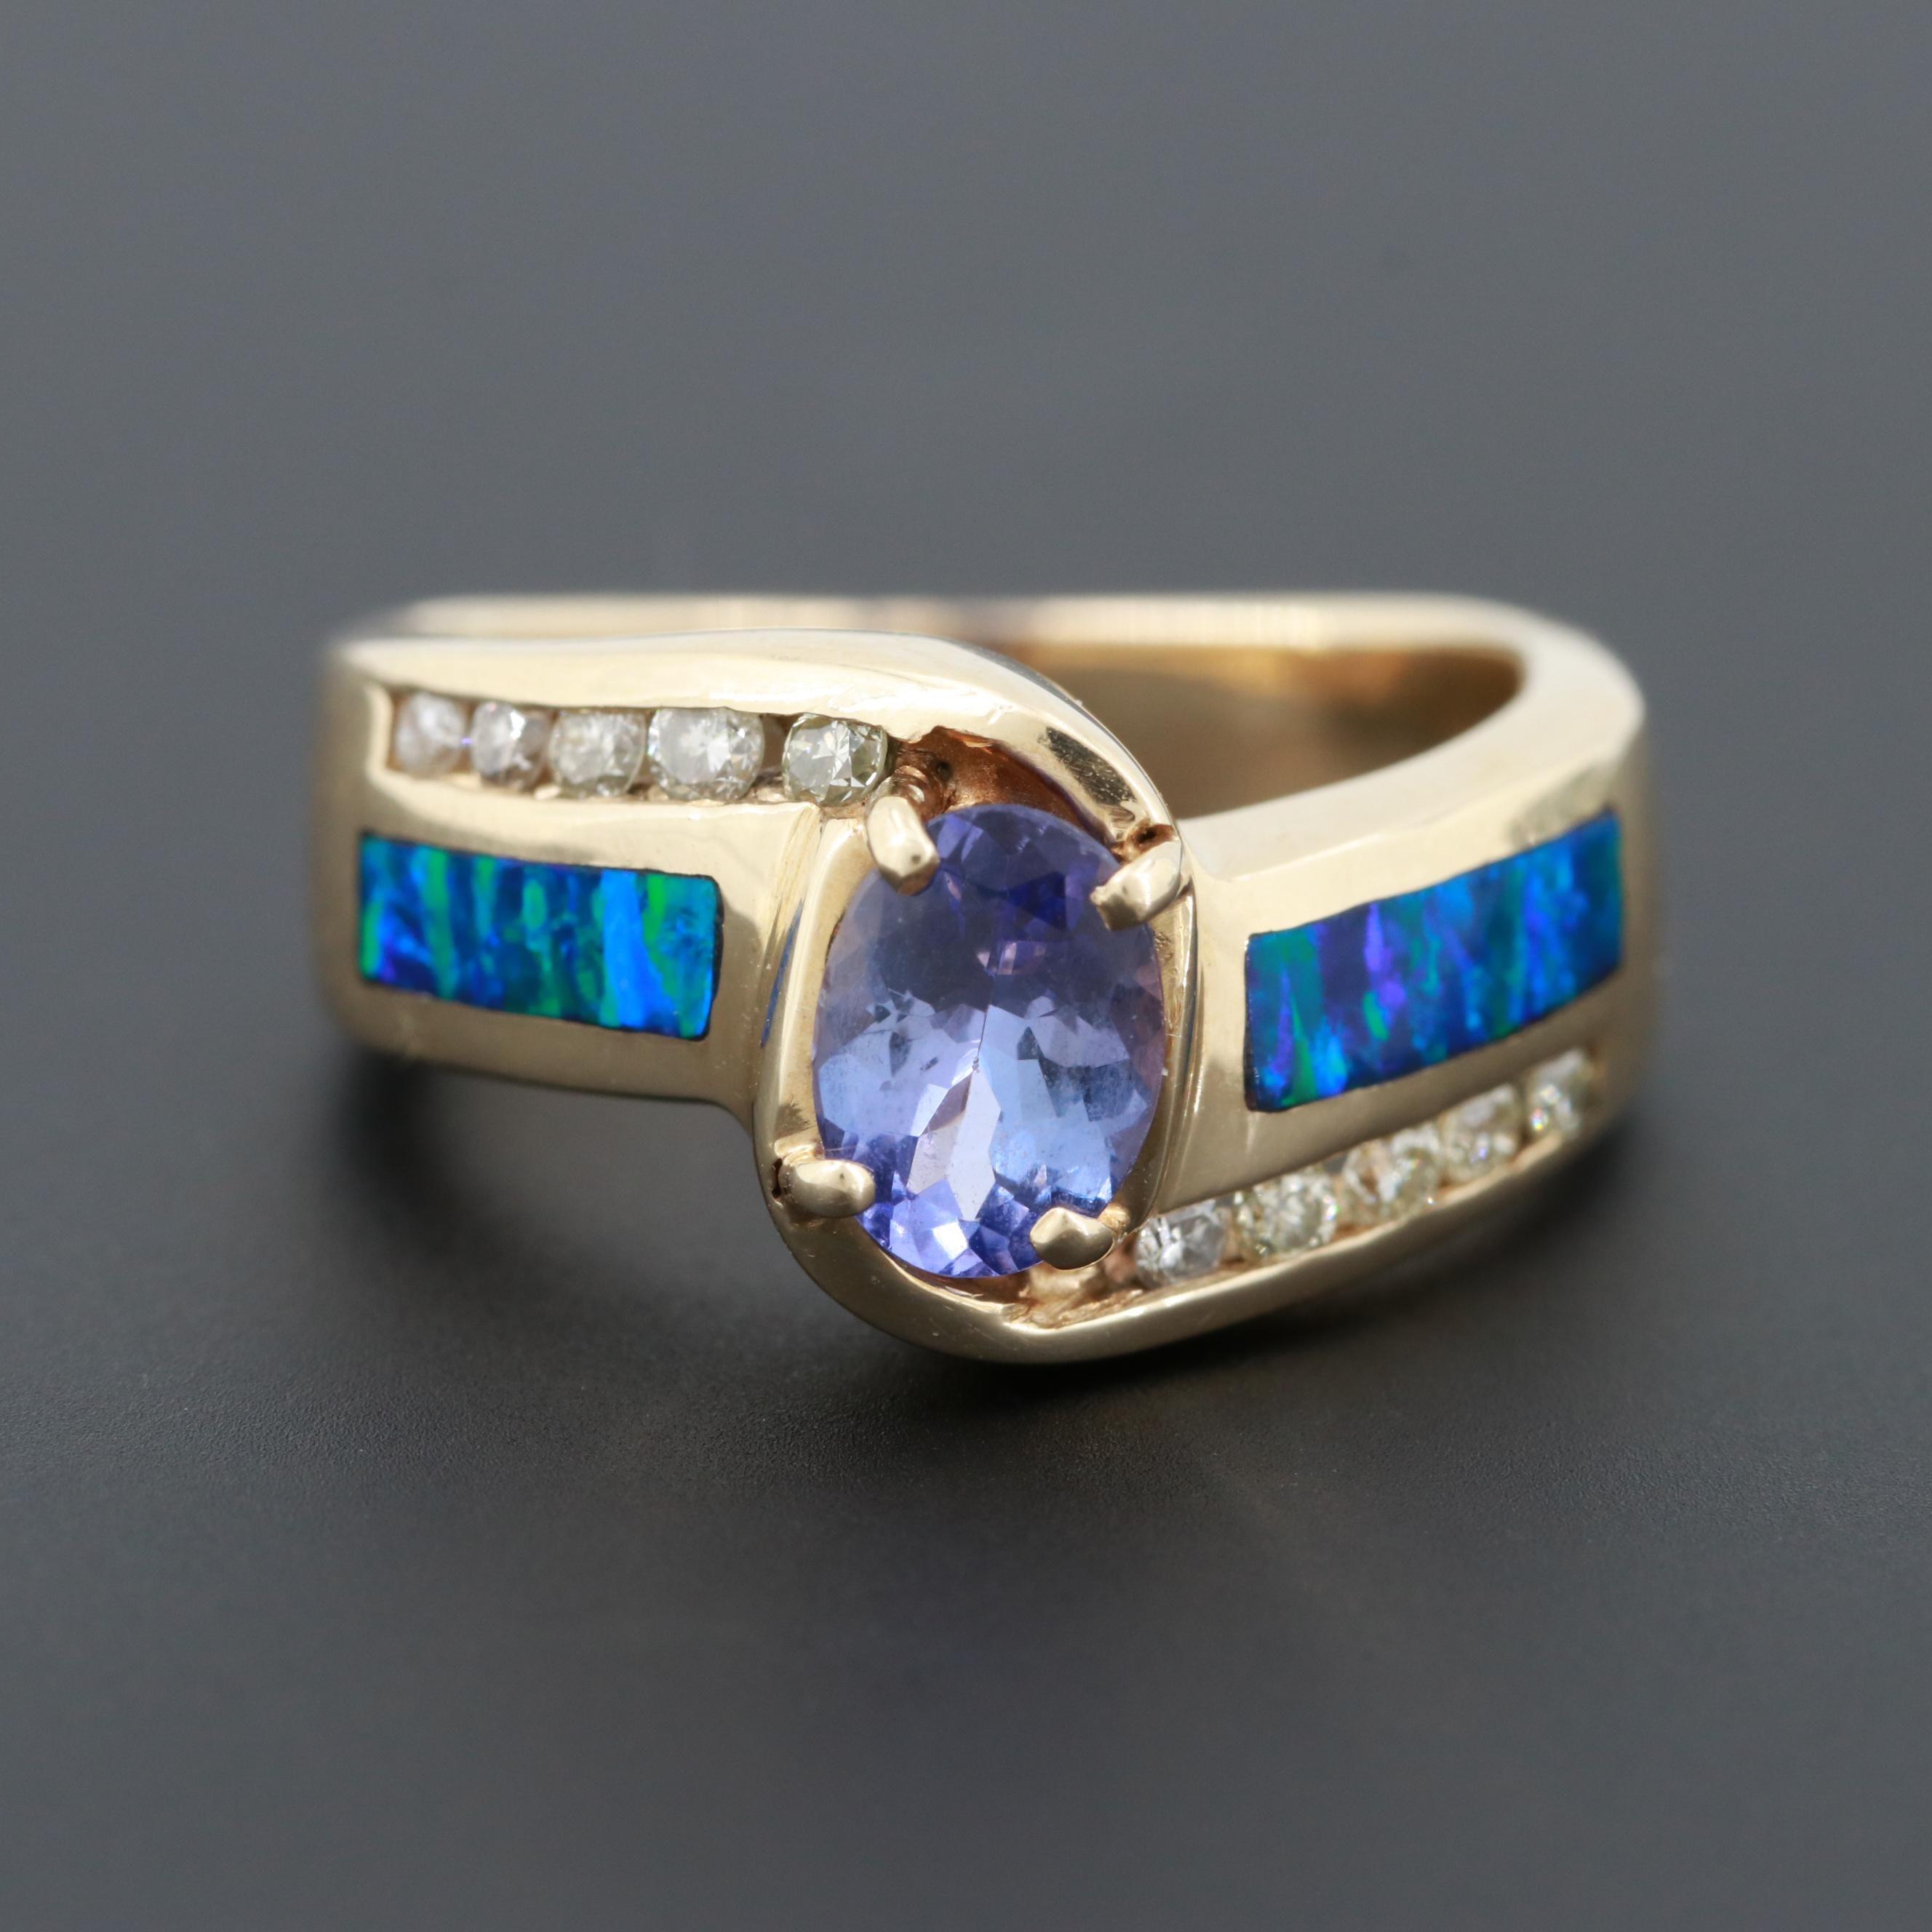 14K Yellow Gold Tanzanite, Diamond and Synthetic Opal Ring